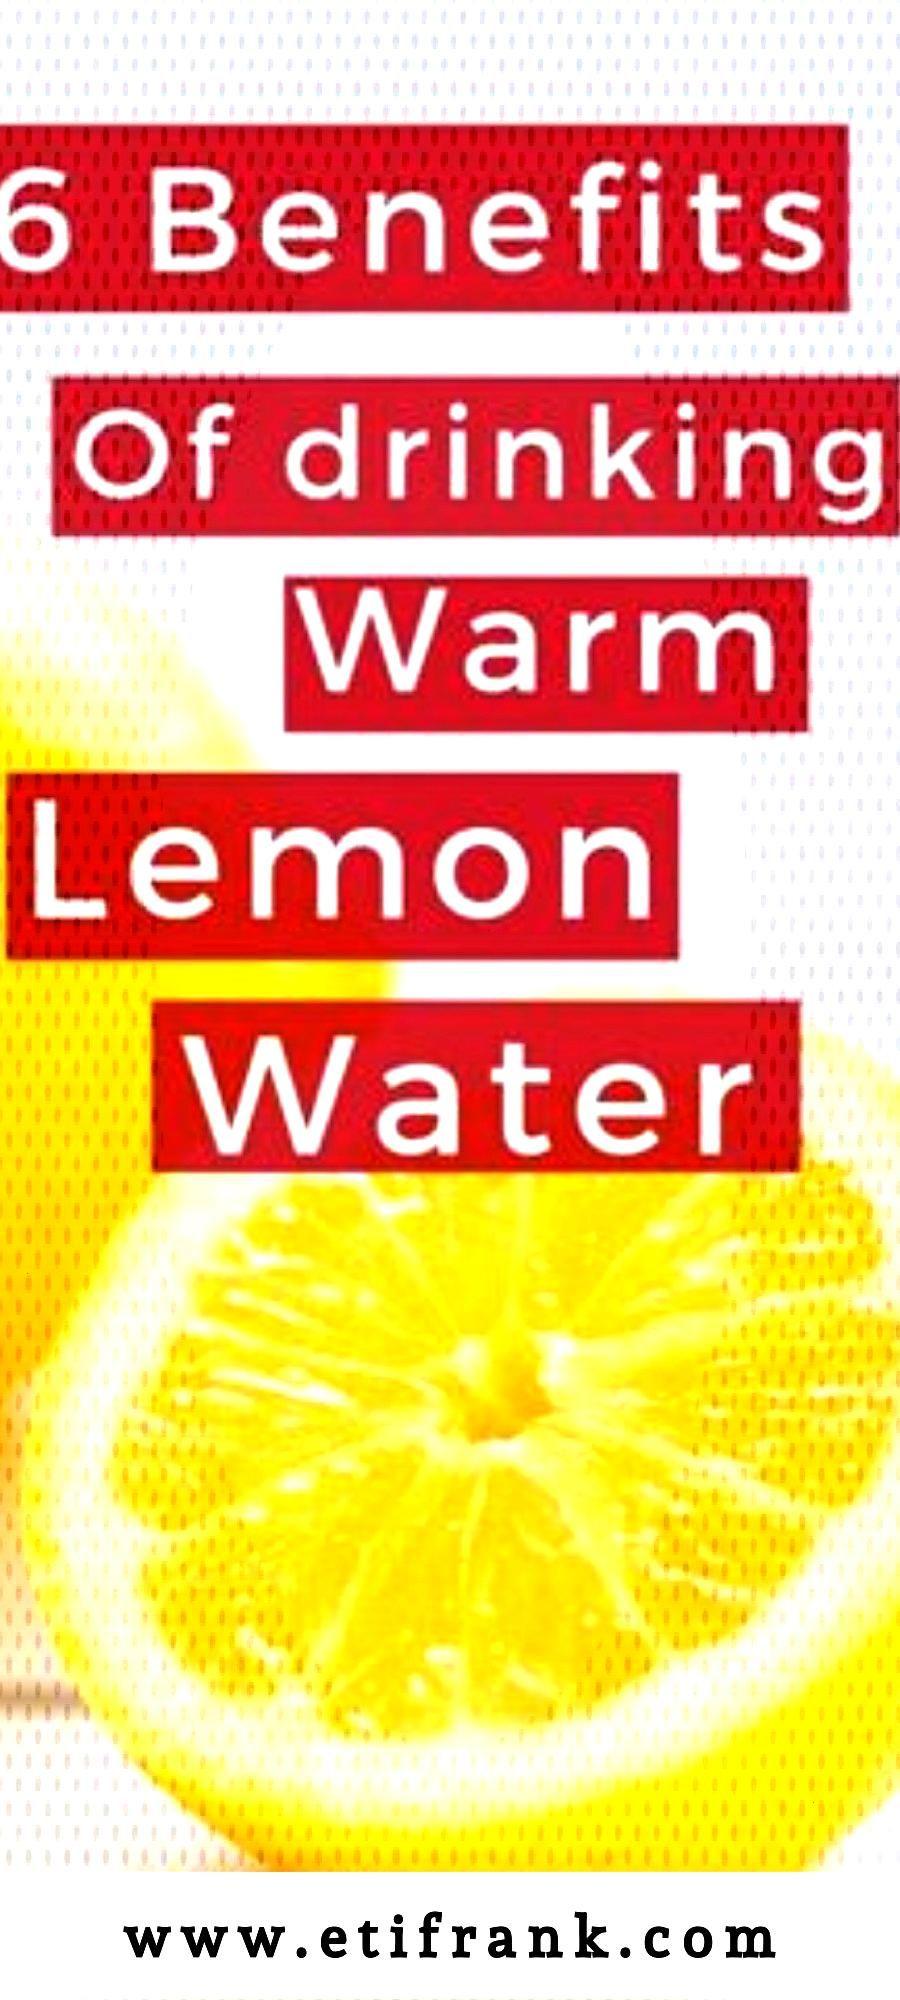 BENEFITS OF DRINKING WARM LEMON WATER    Nowadays, lemon water seems to be the latest rage. Man